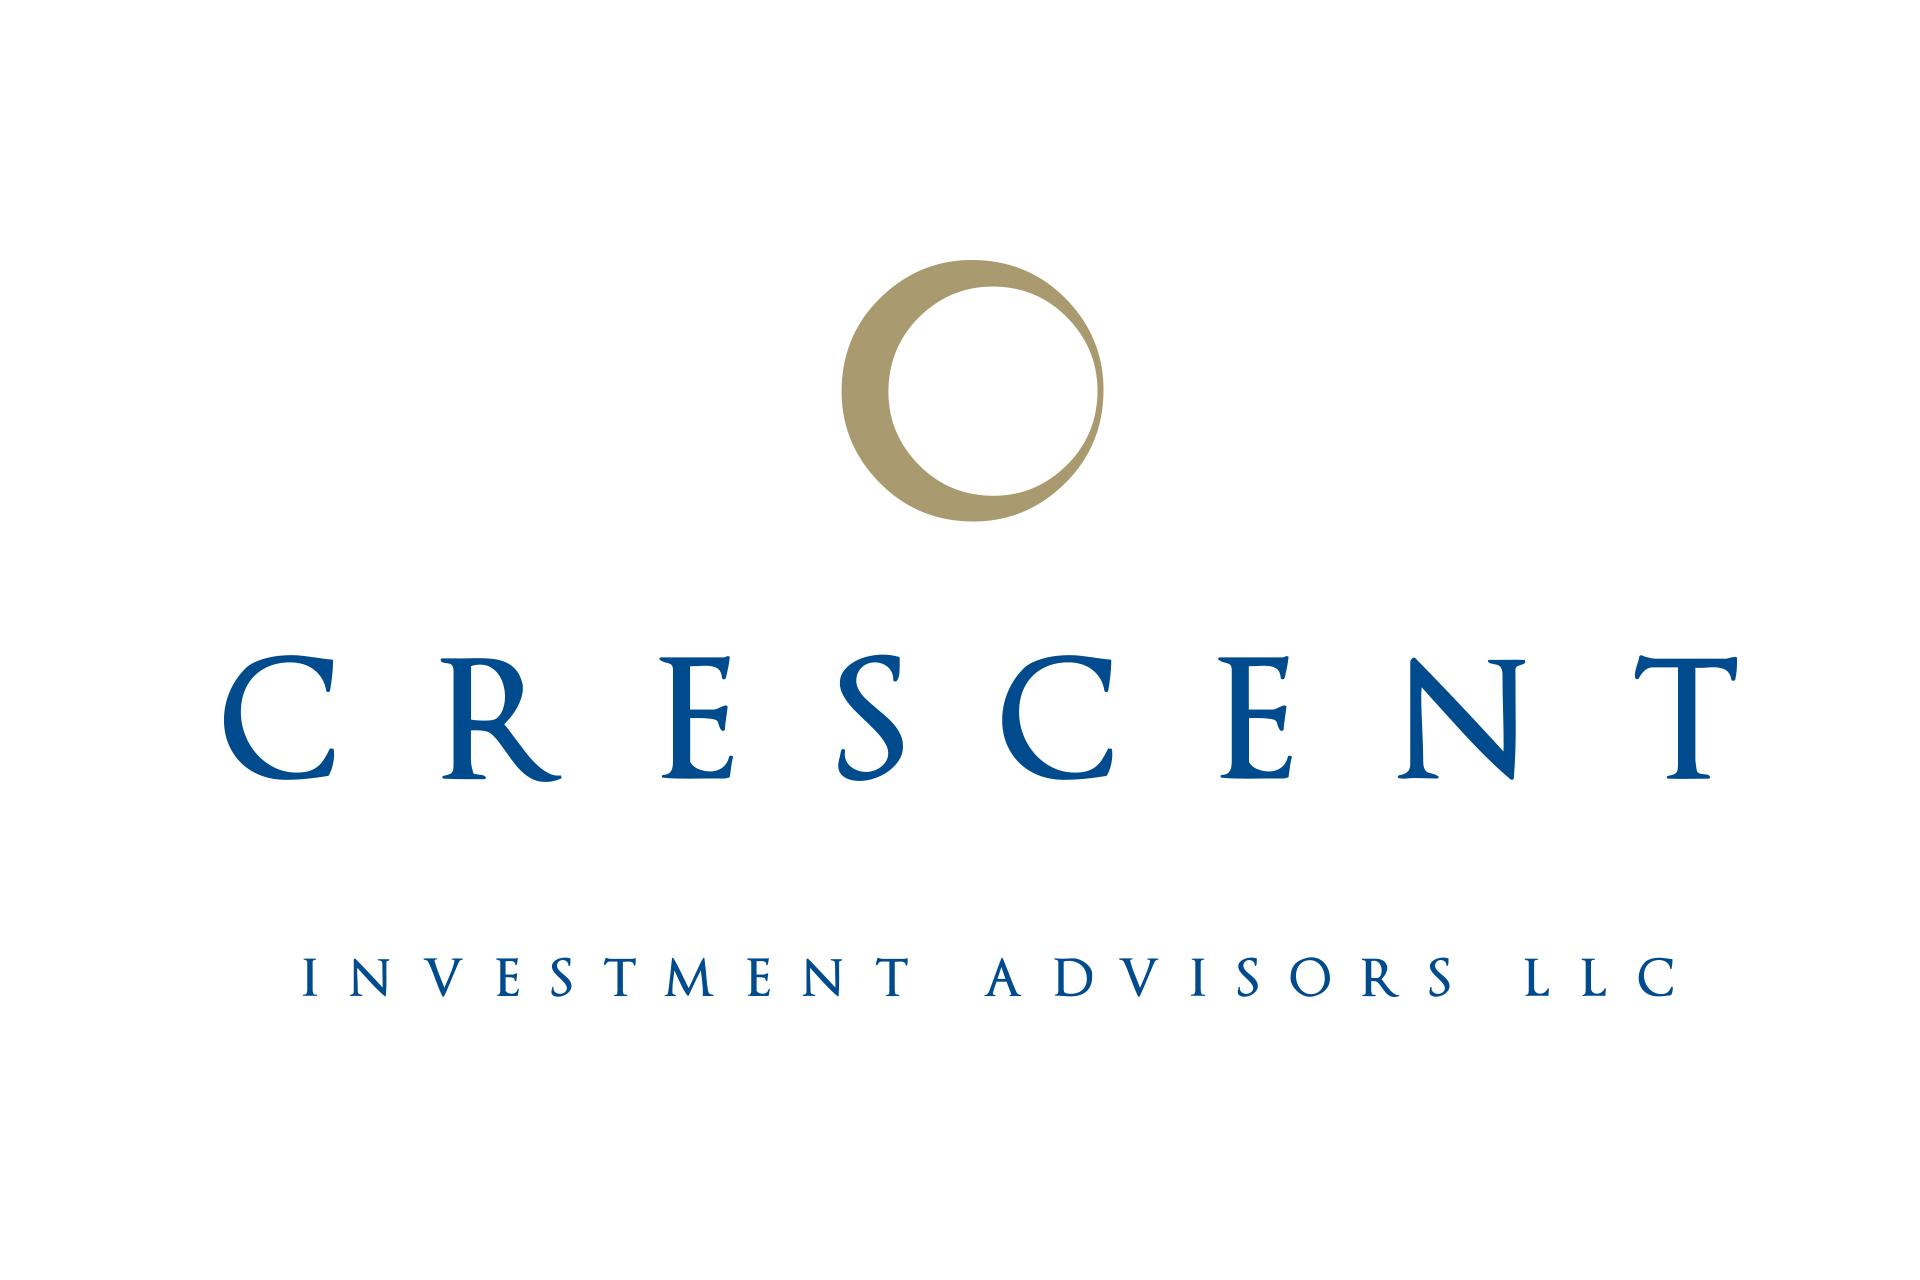 Crescent Advisors